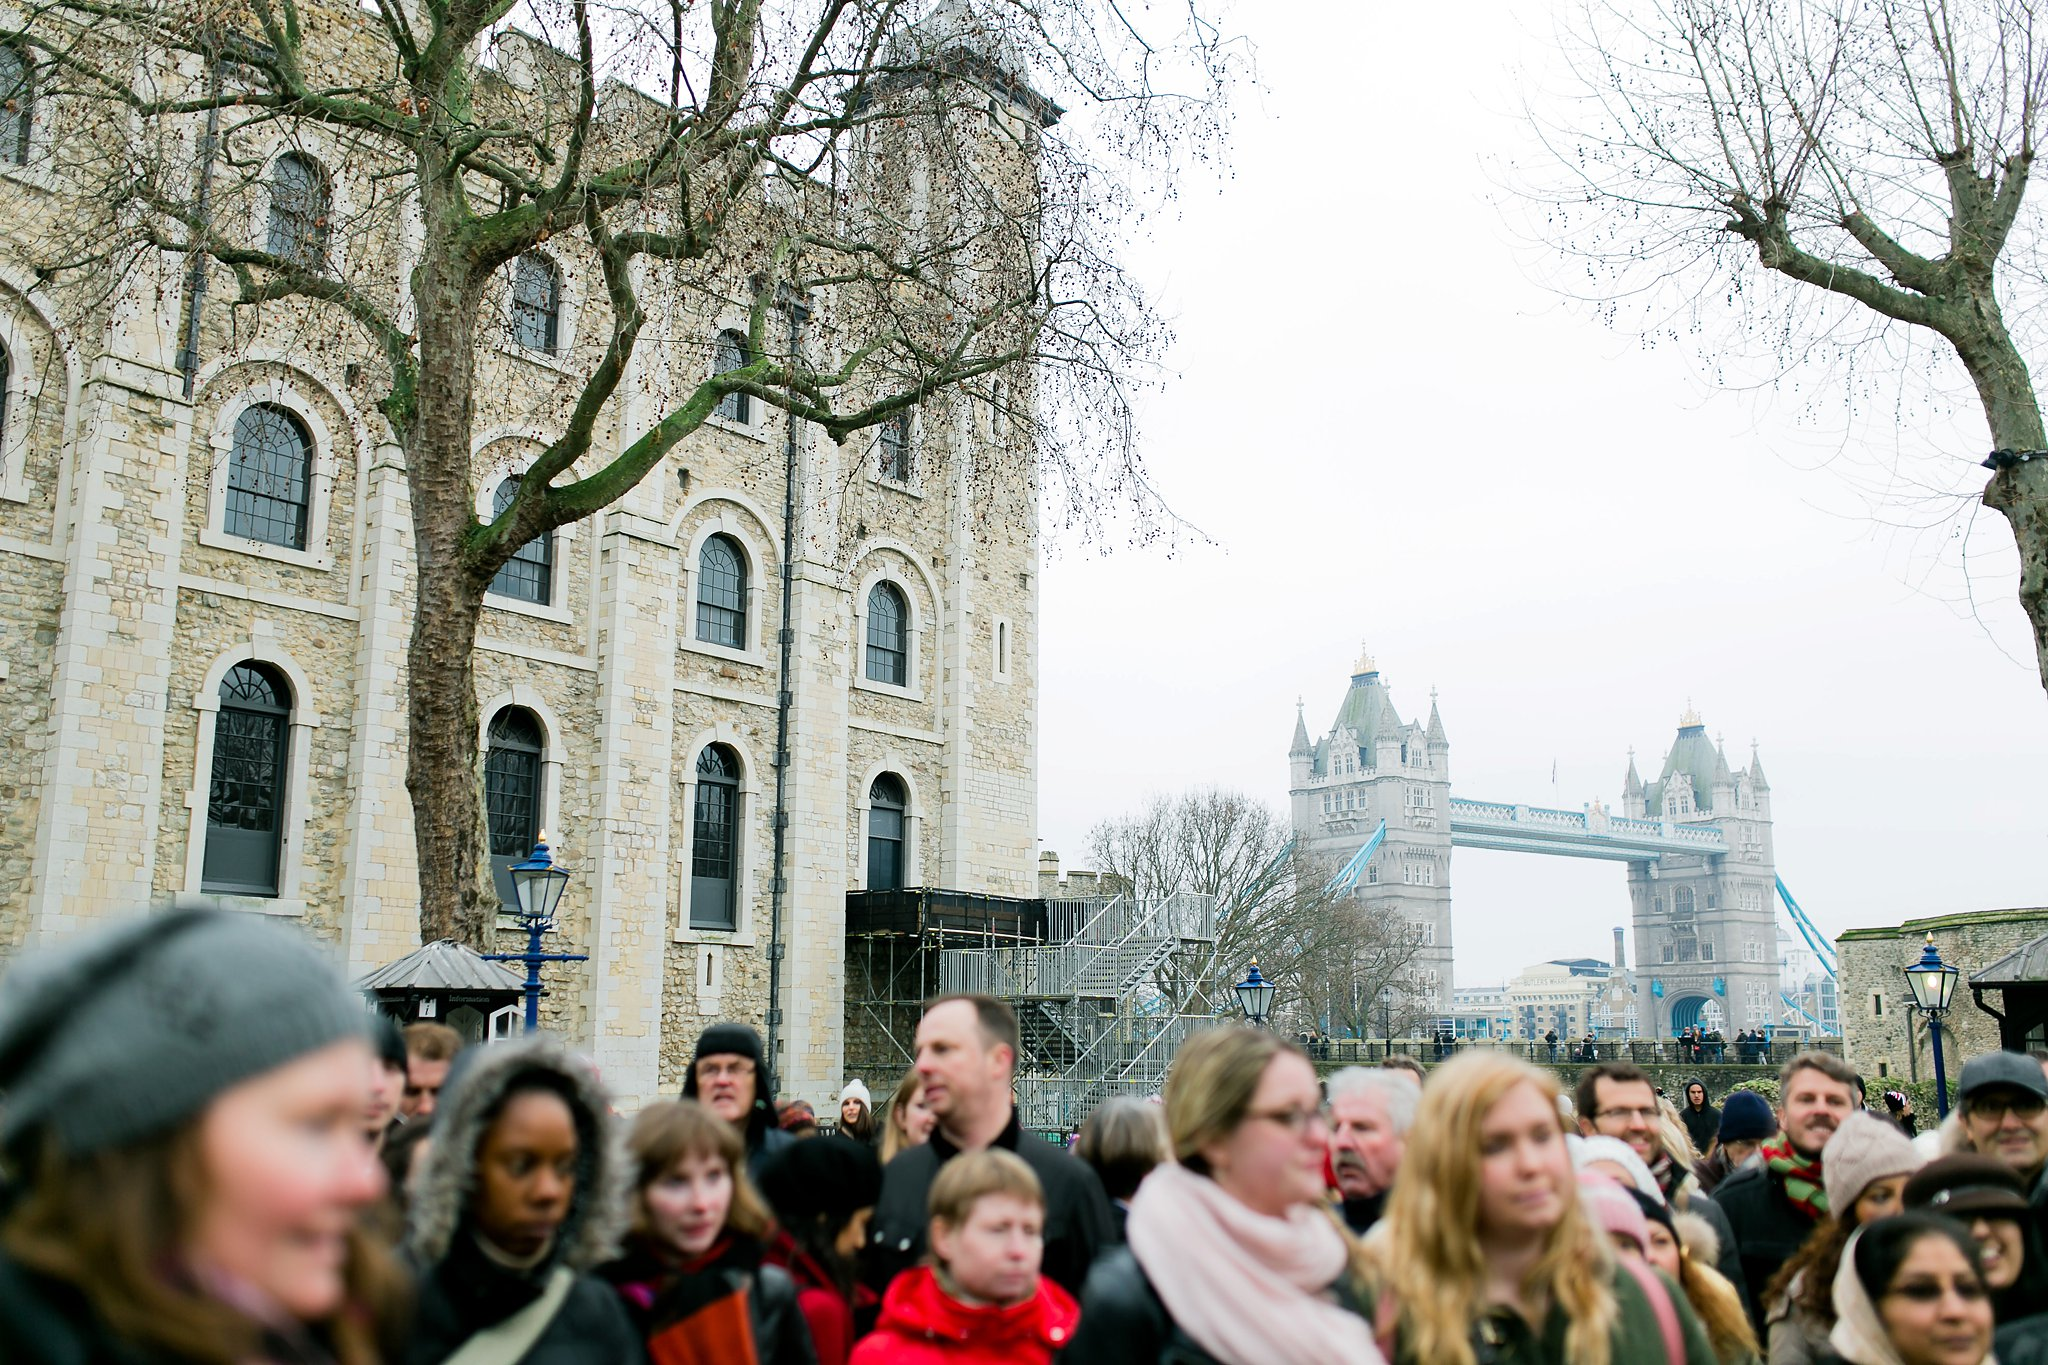 London Part II Westminster Abbey Tower Bridge Tower of London Big Ben-1693.jpg